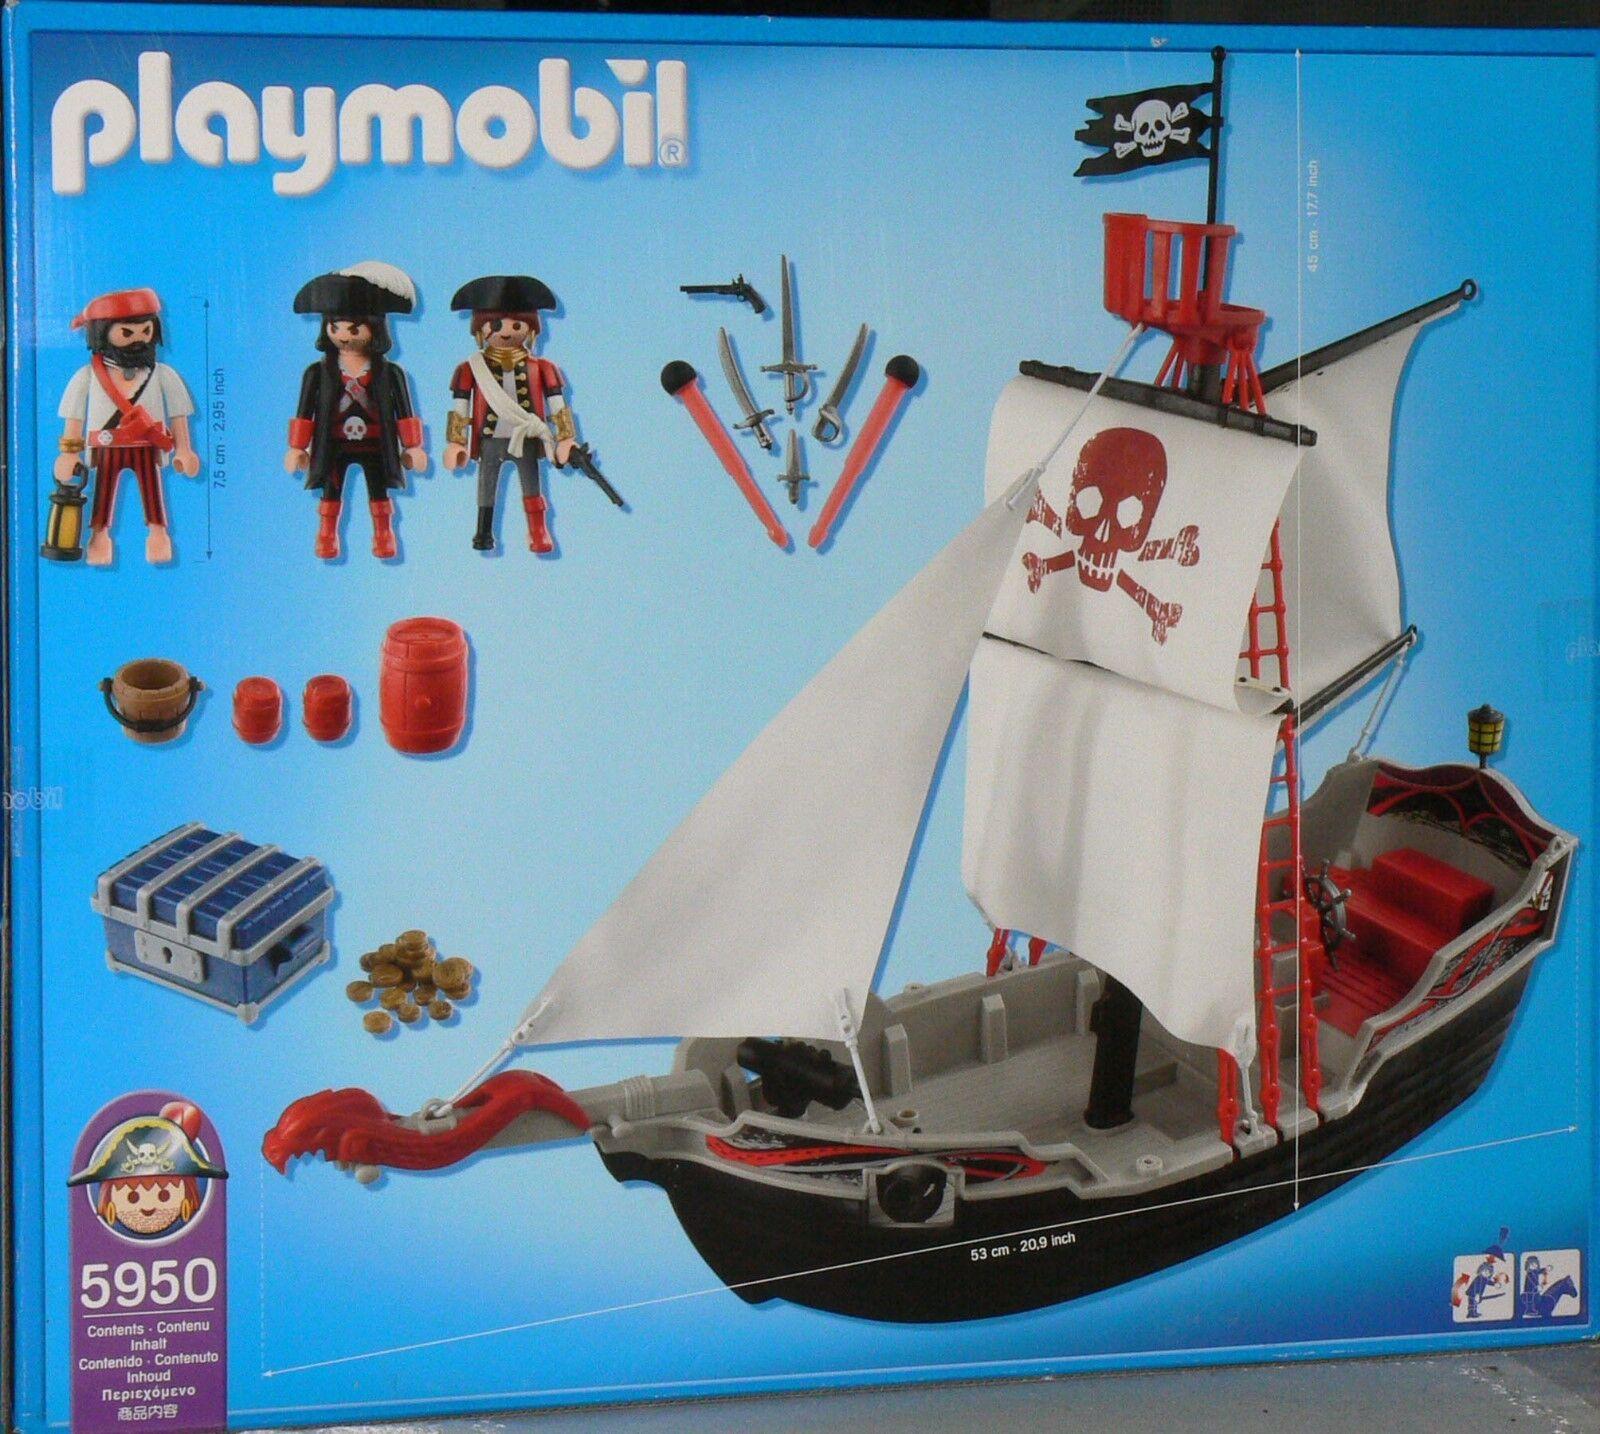 Playmobil Skull and Bones Ship  Pirate Ship Toy Set Brand New Unopened Box